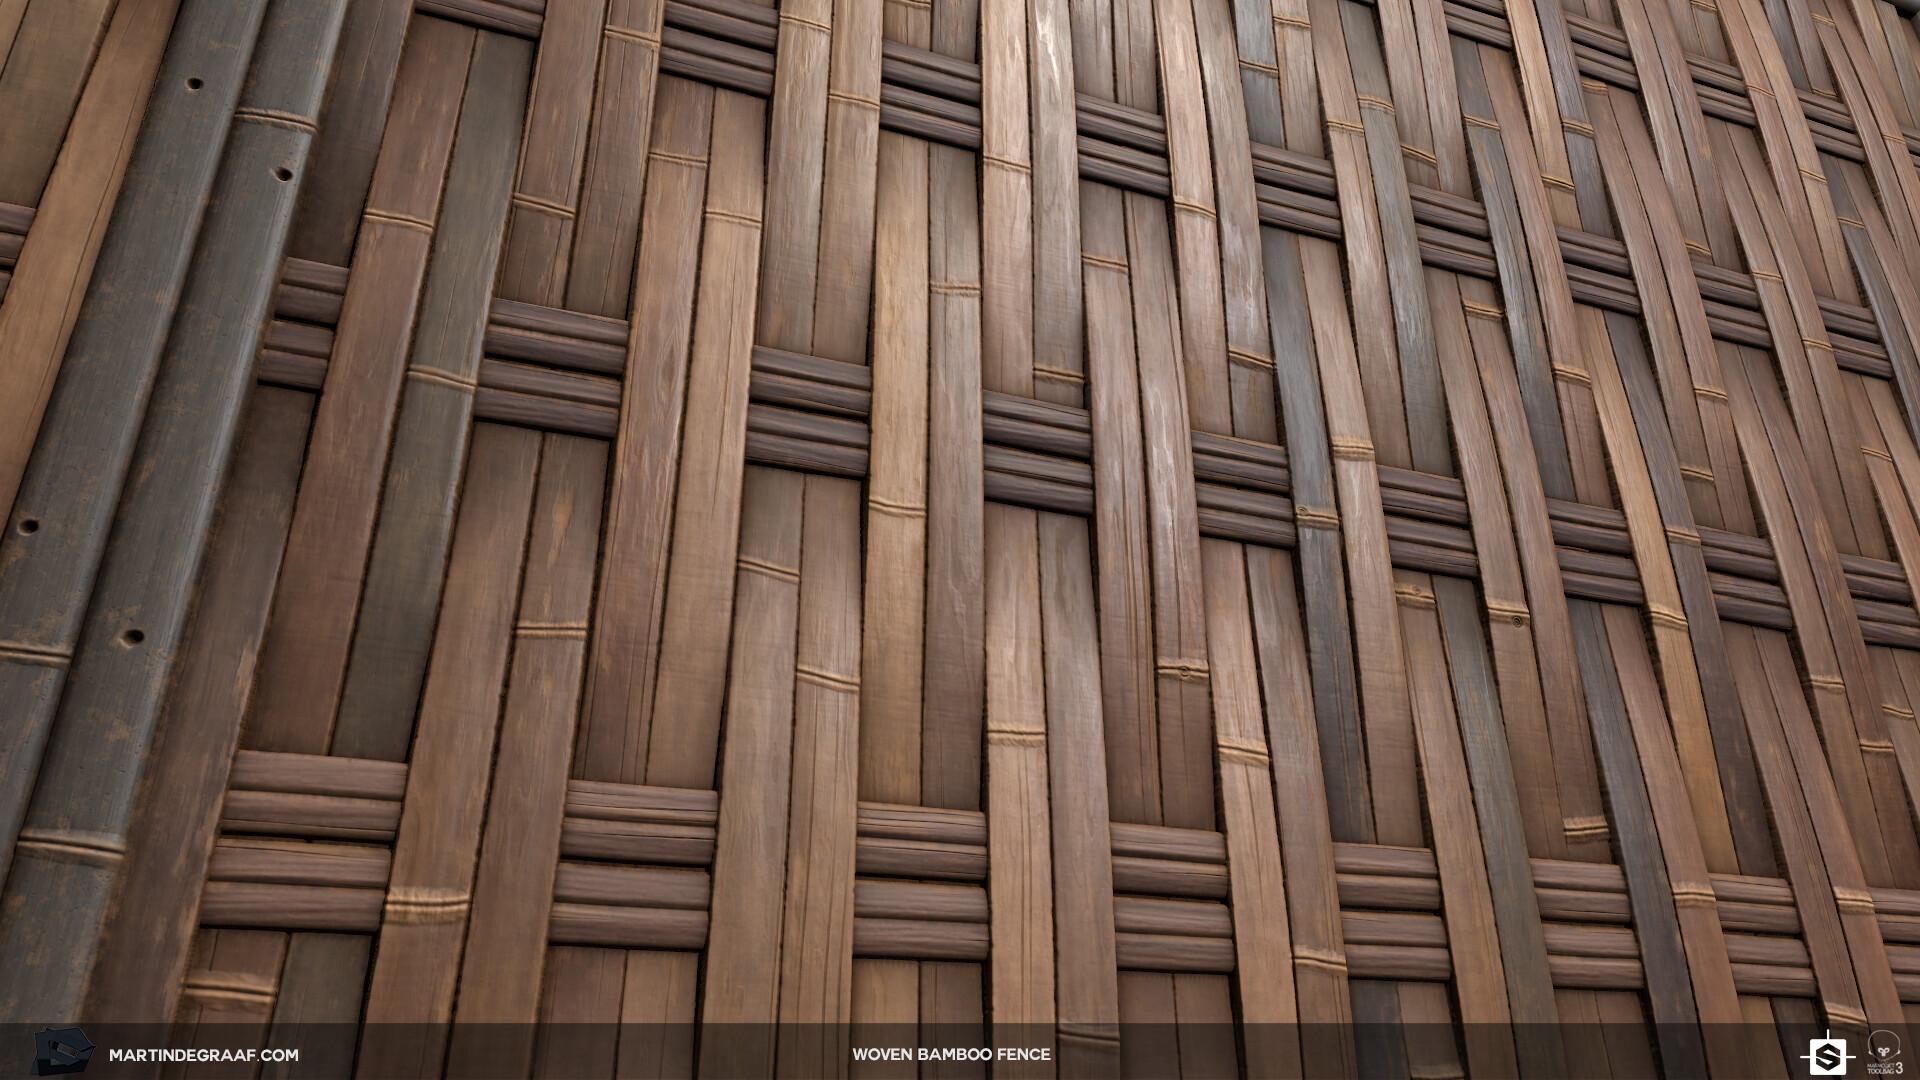 ArtStation - Martin de Graaf - Material Study: Woven Bamboo